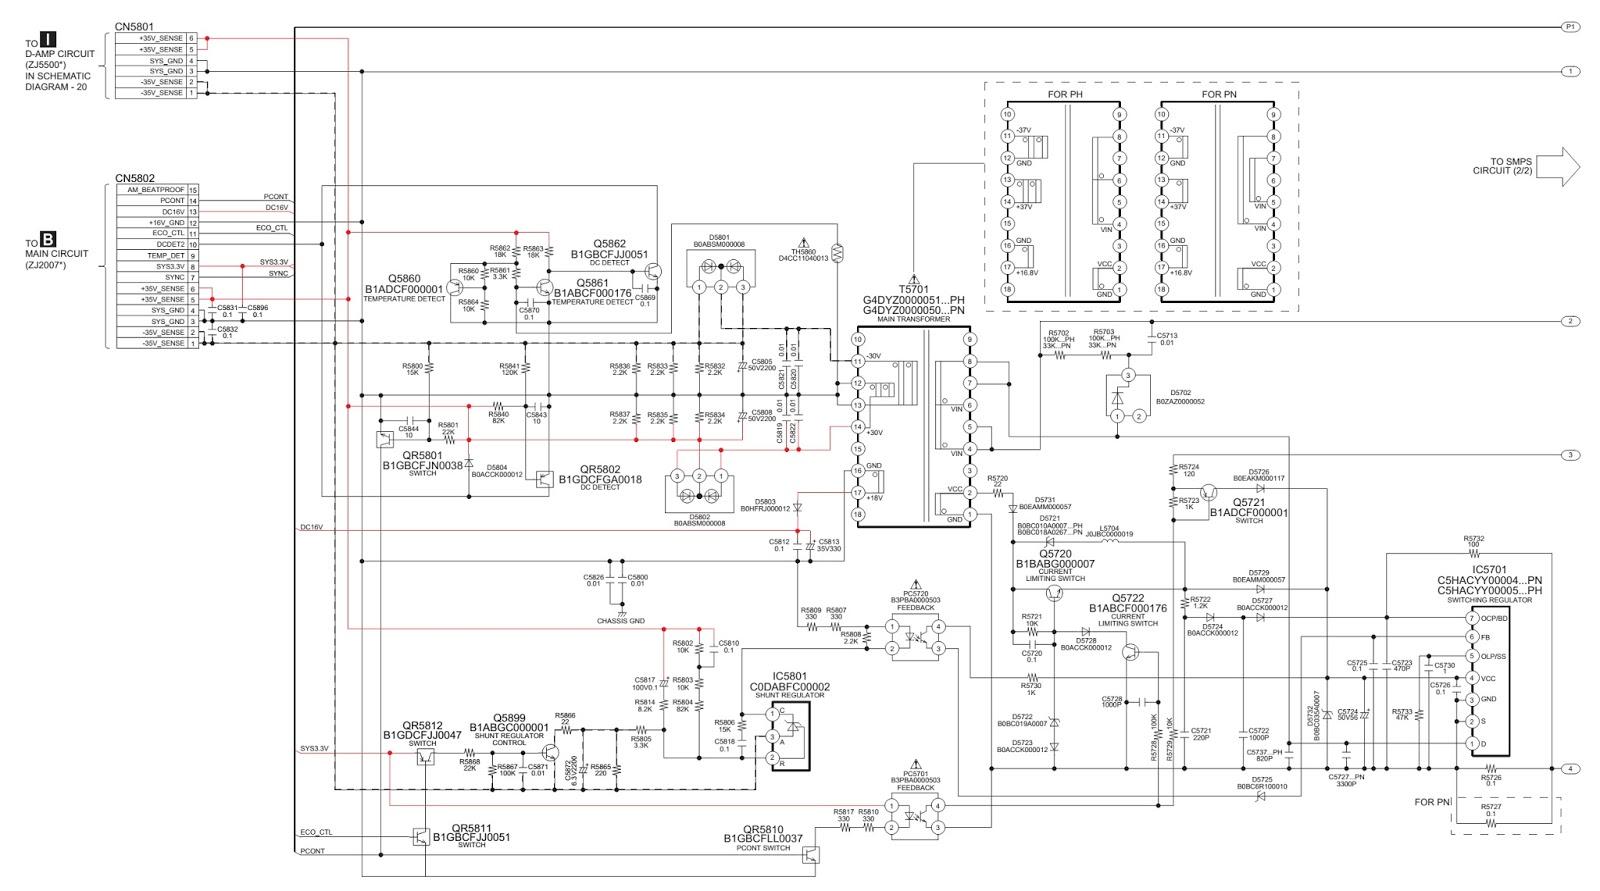 panasonic sc akx52lb schematic circuit diagram smps. Black Bedroom Furniture Sets. Home Design Ideas